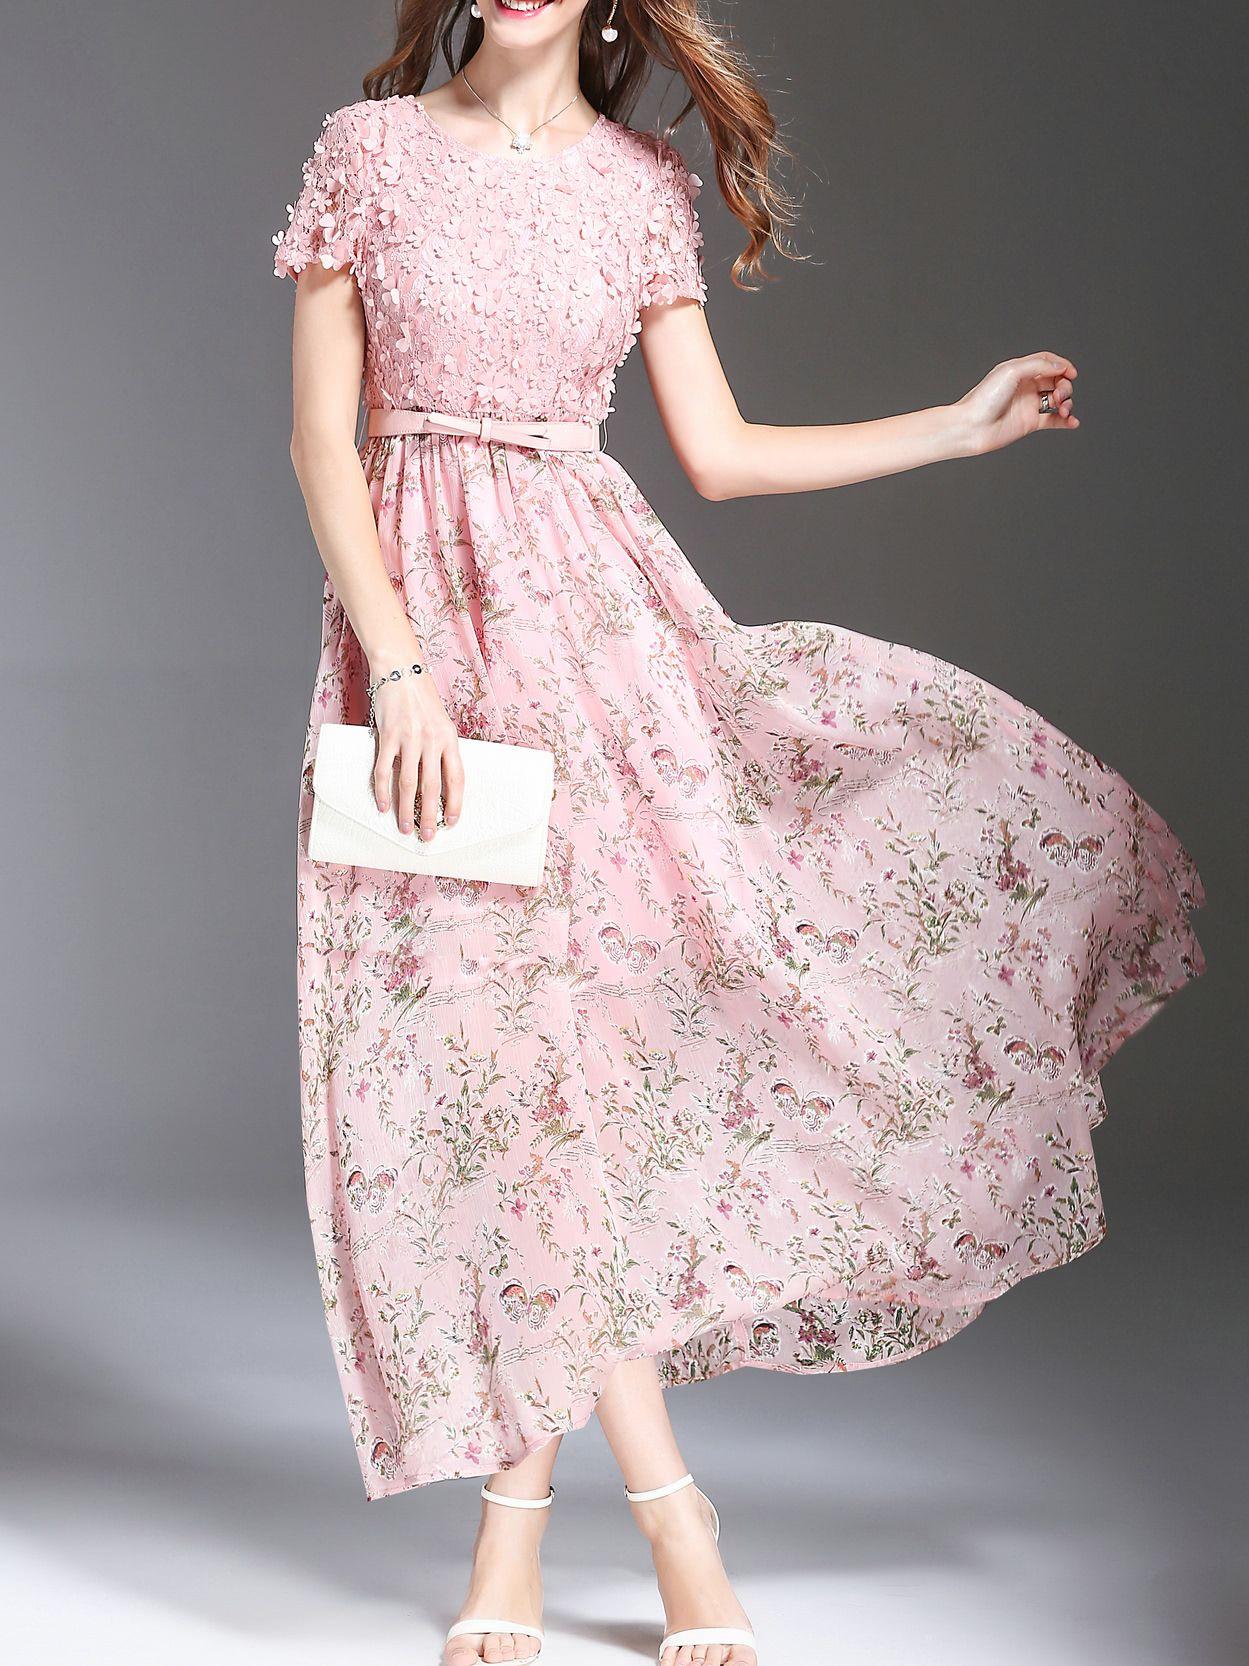 7a431ce5ce Flowers Applique Beading Floral Dress -SheIn(Sheinside) | Shein ...